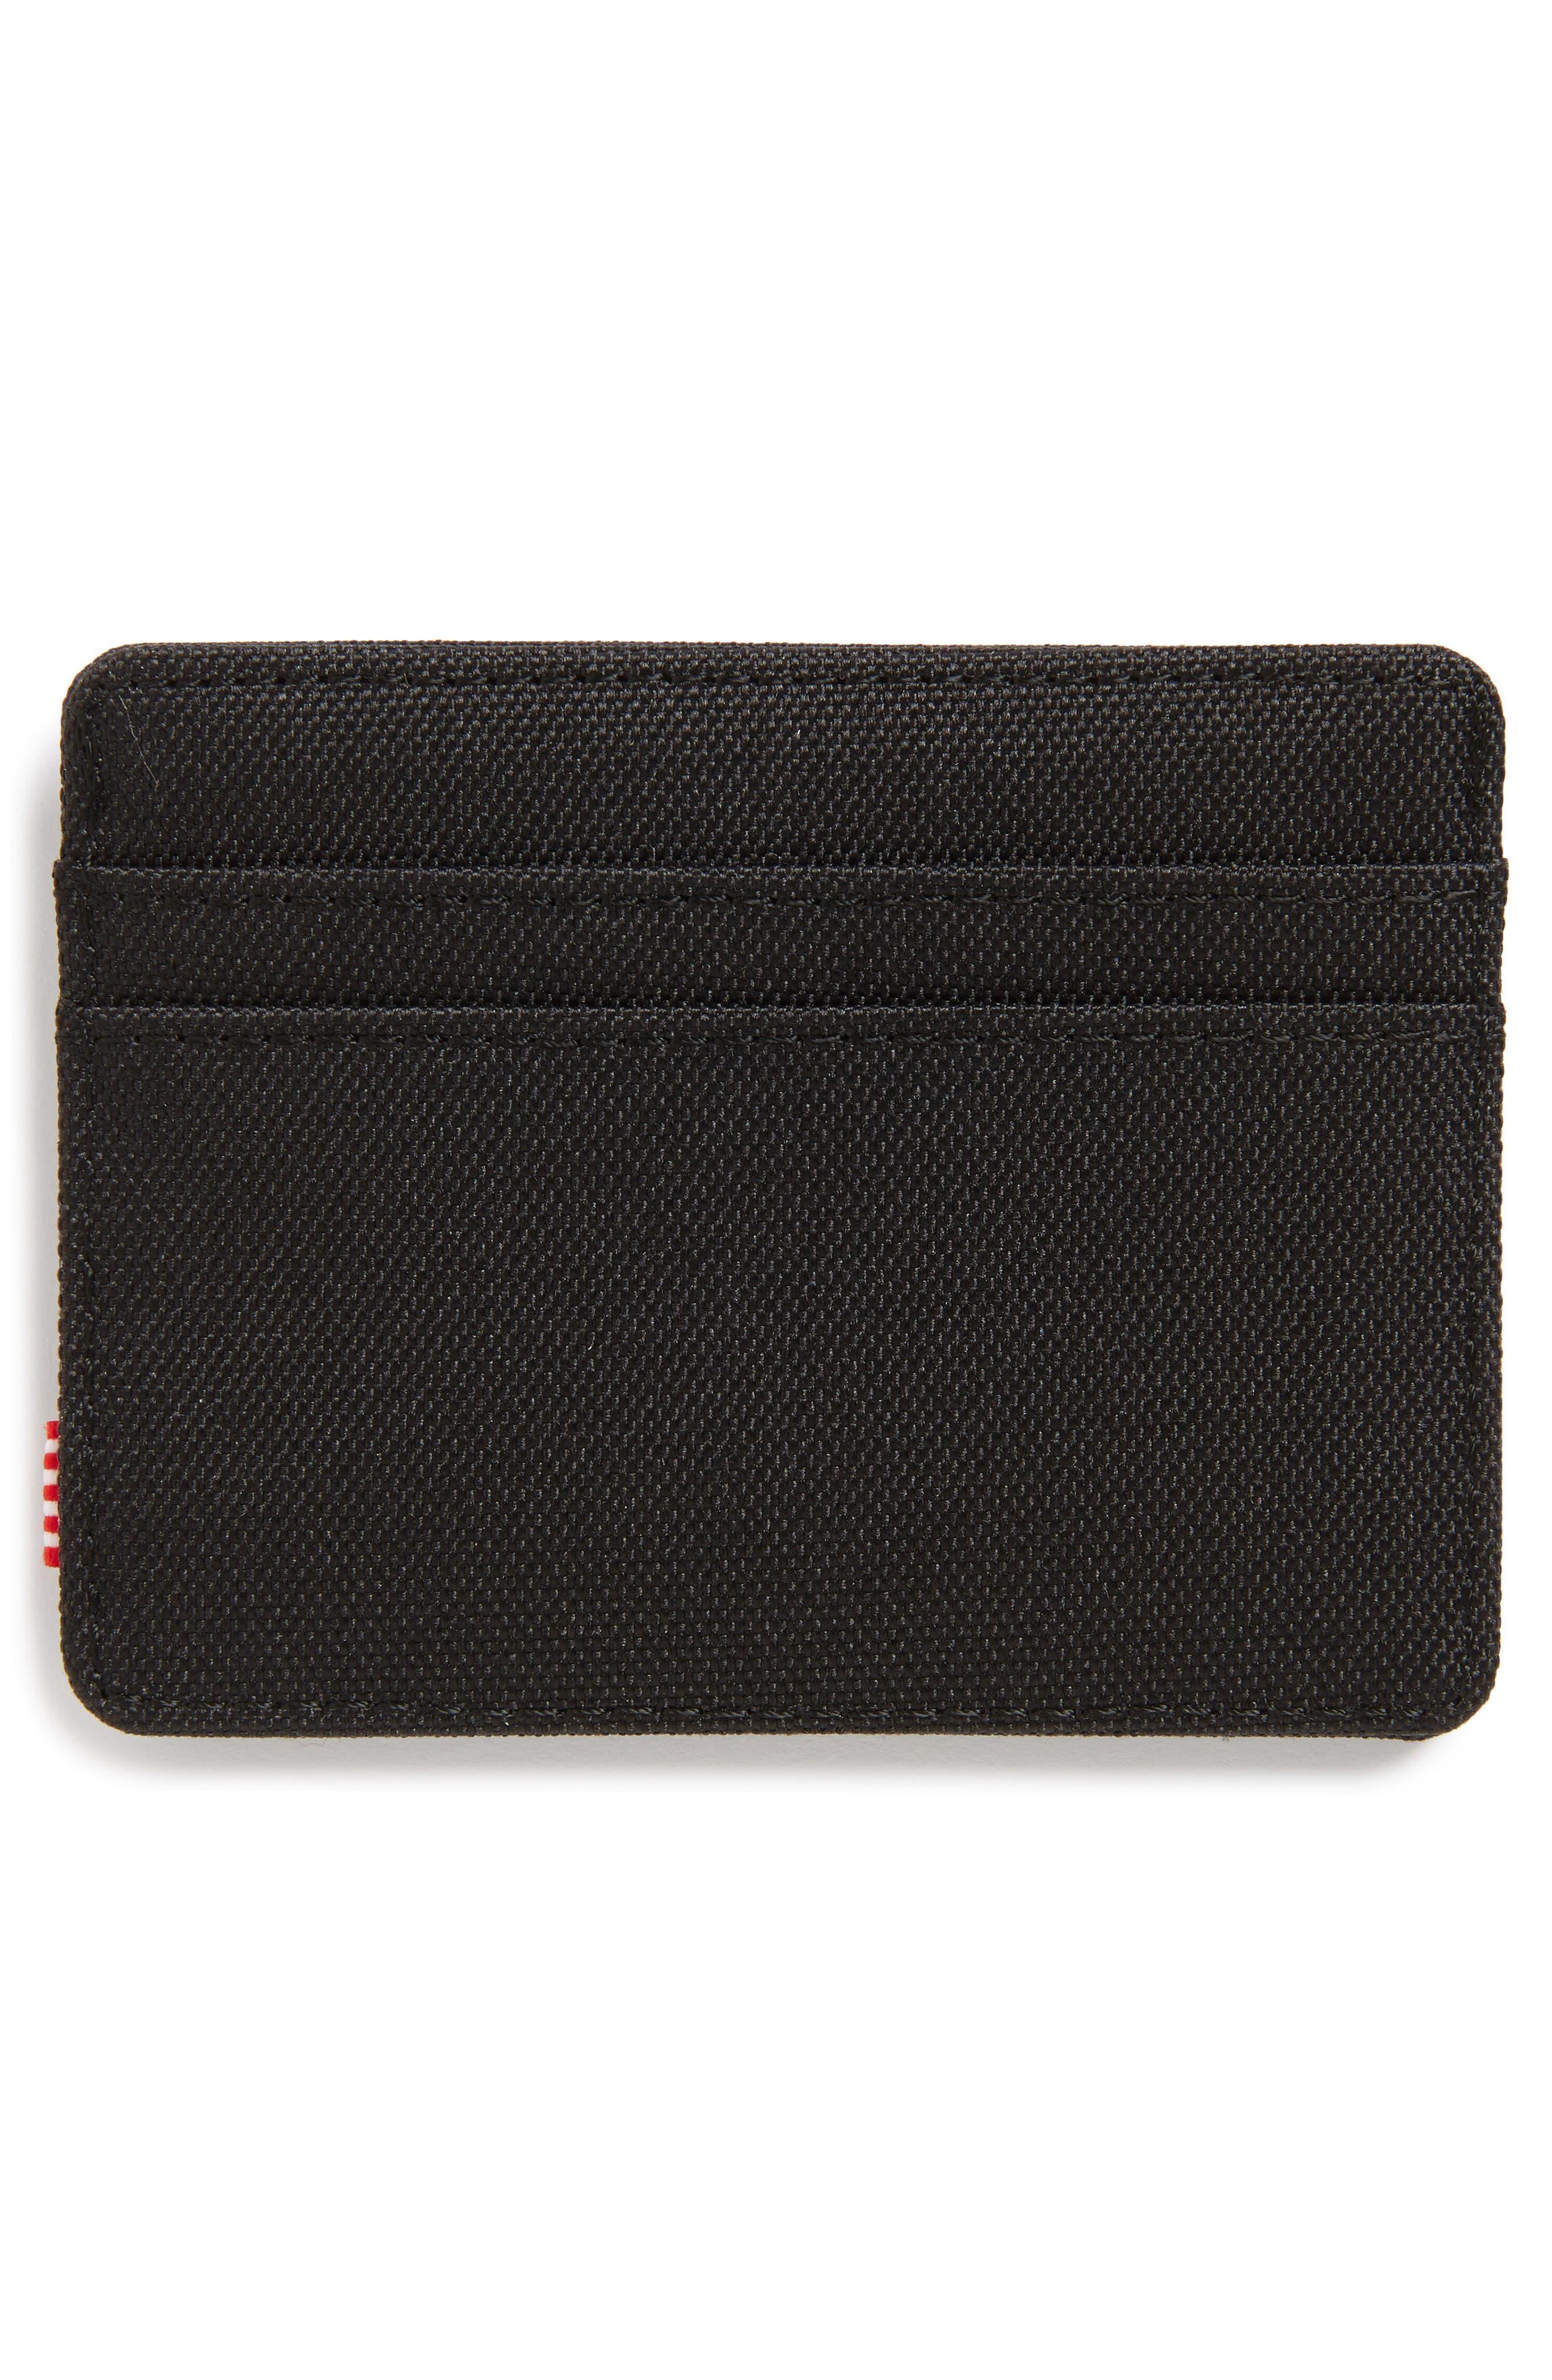 Charlie RFID Card Case,                             Alternate thumbnail 2, color,                             Black